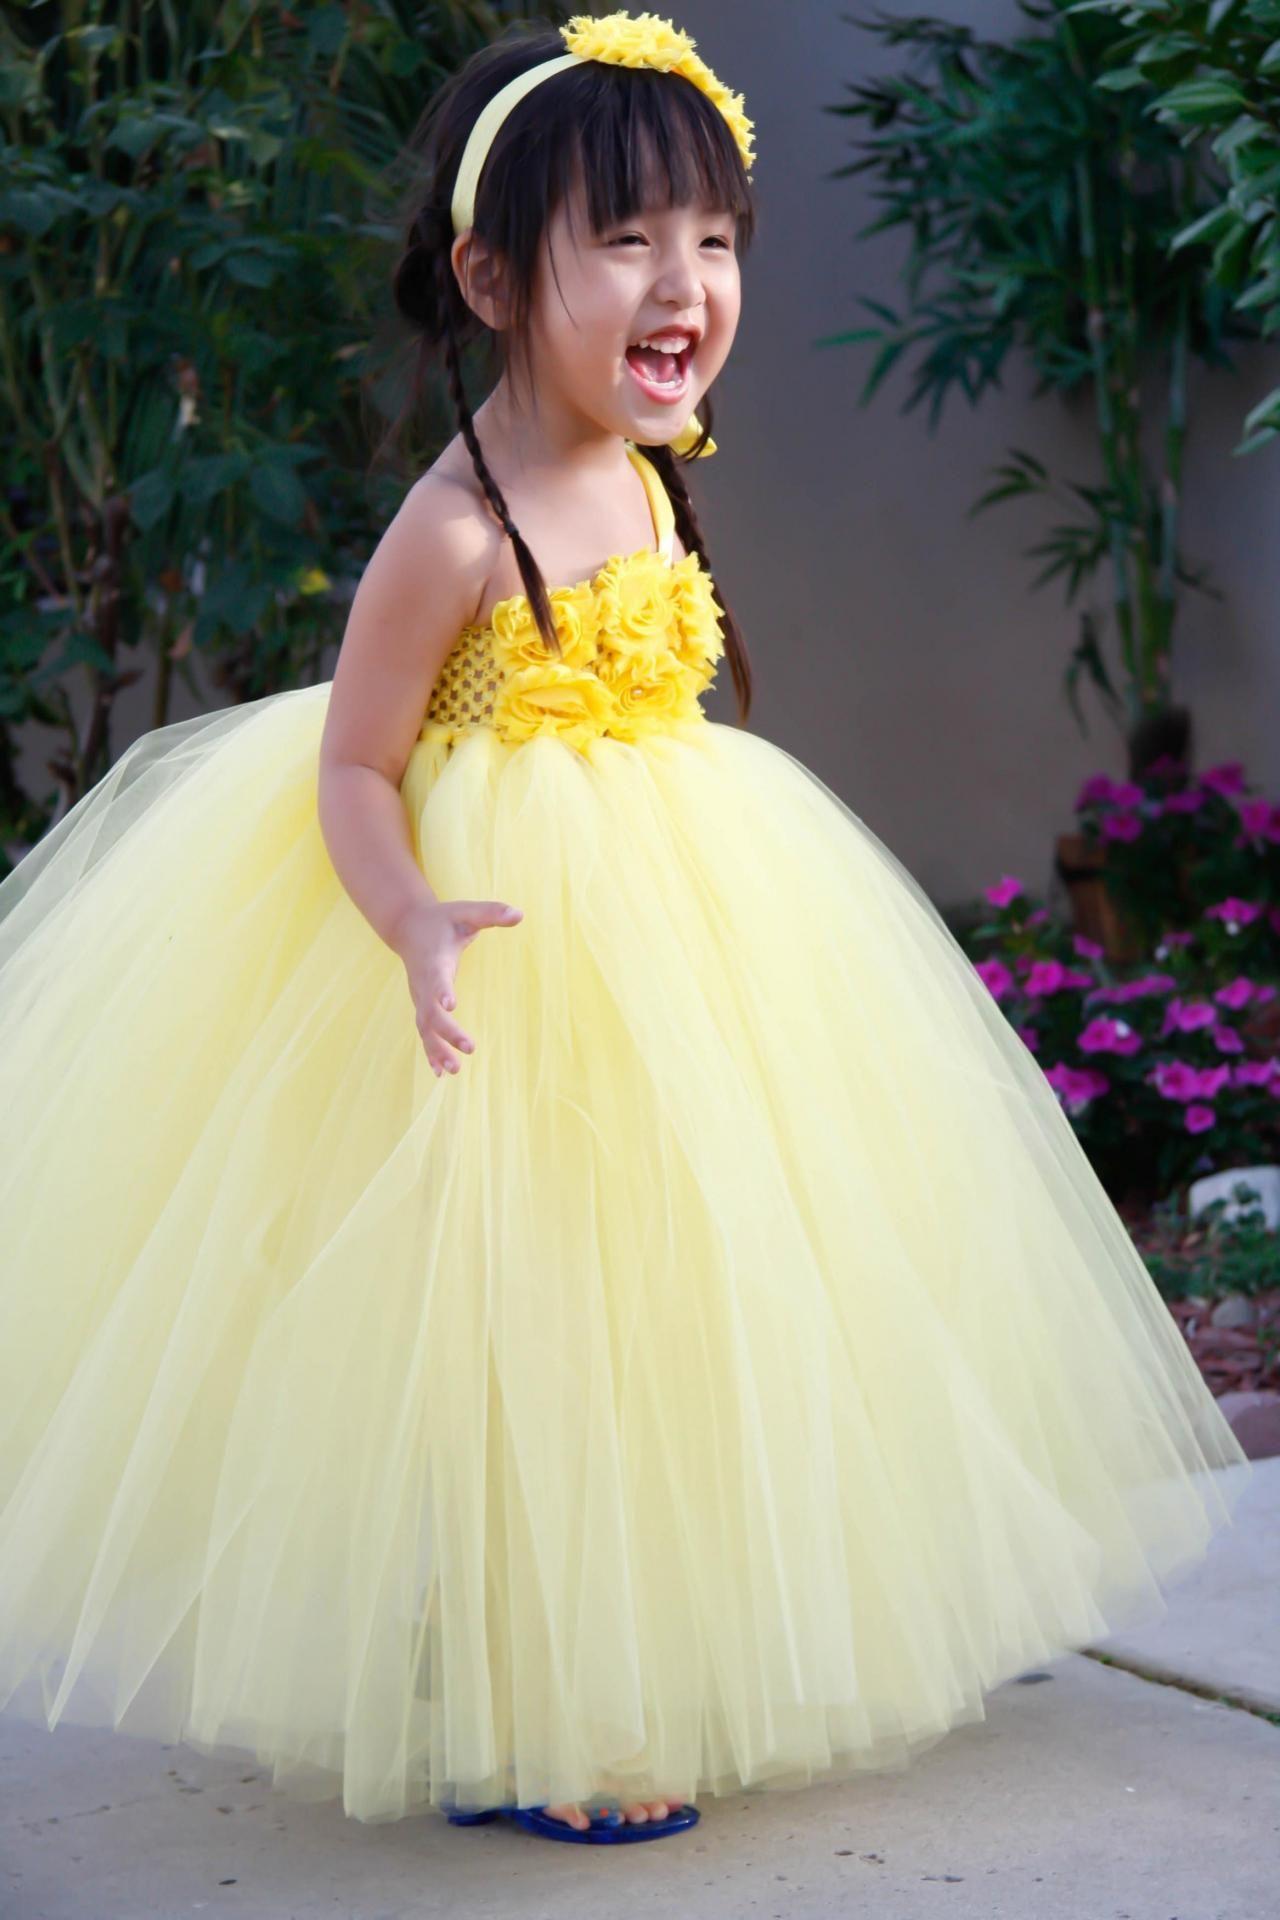 Rustic wedding flower girl dresses   Flower girl dress Yellow with Yellow Shabby Flowers TuTu Dress